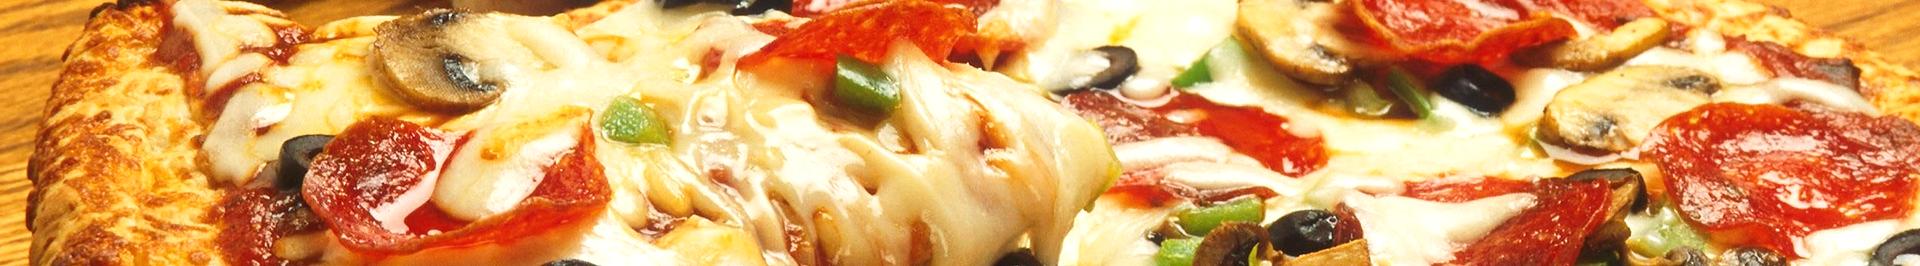 pizza-cesni-banner-spice-effendy